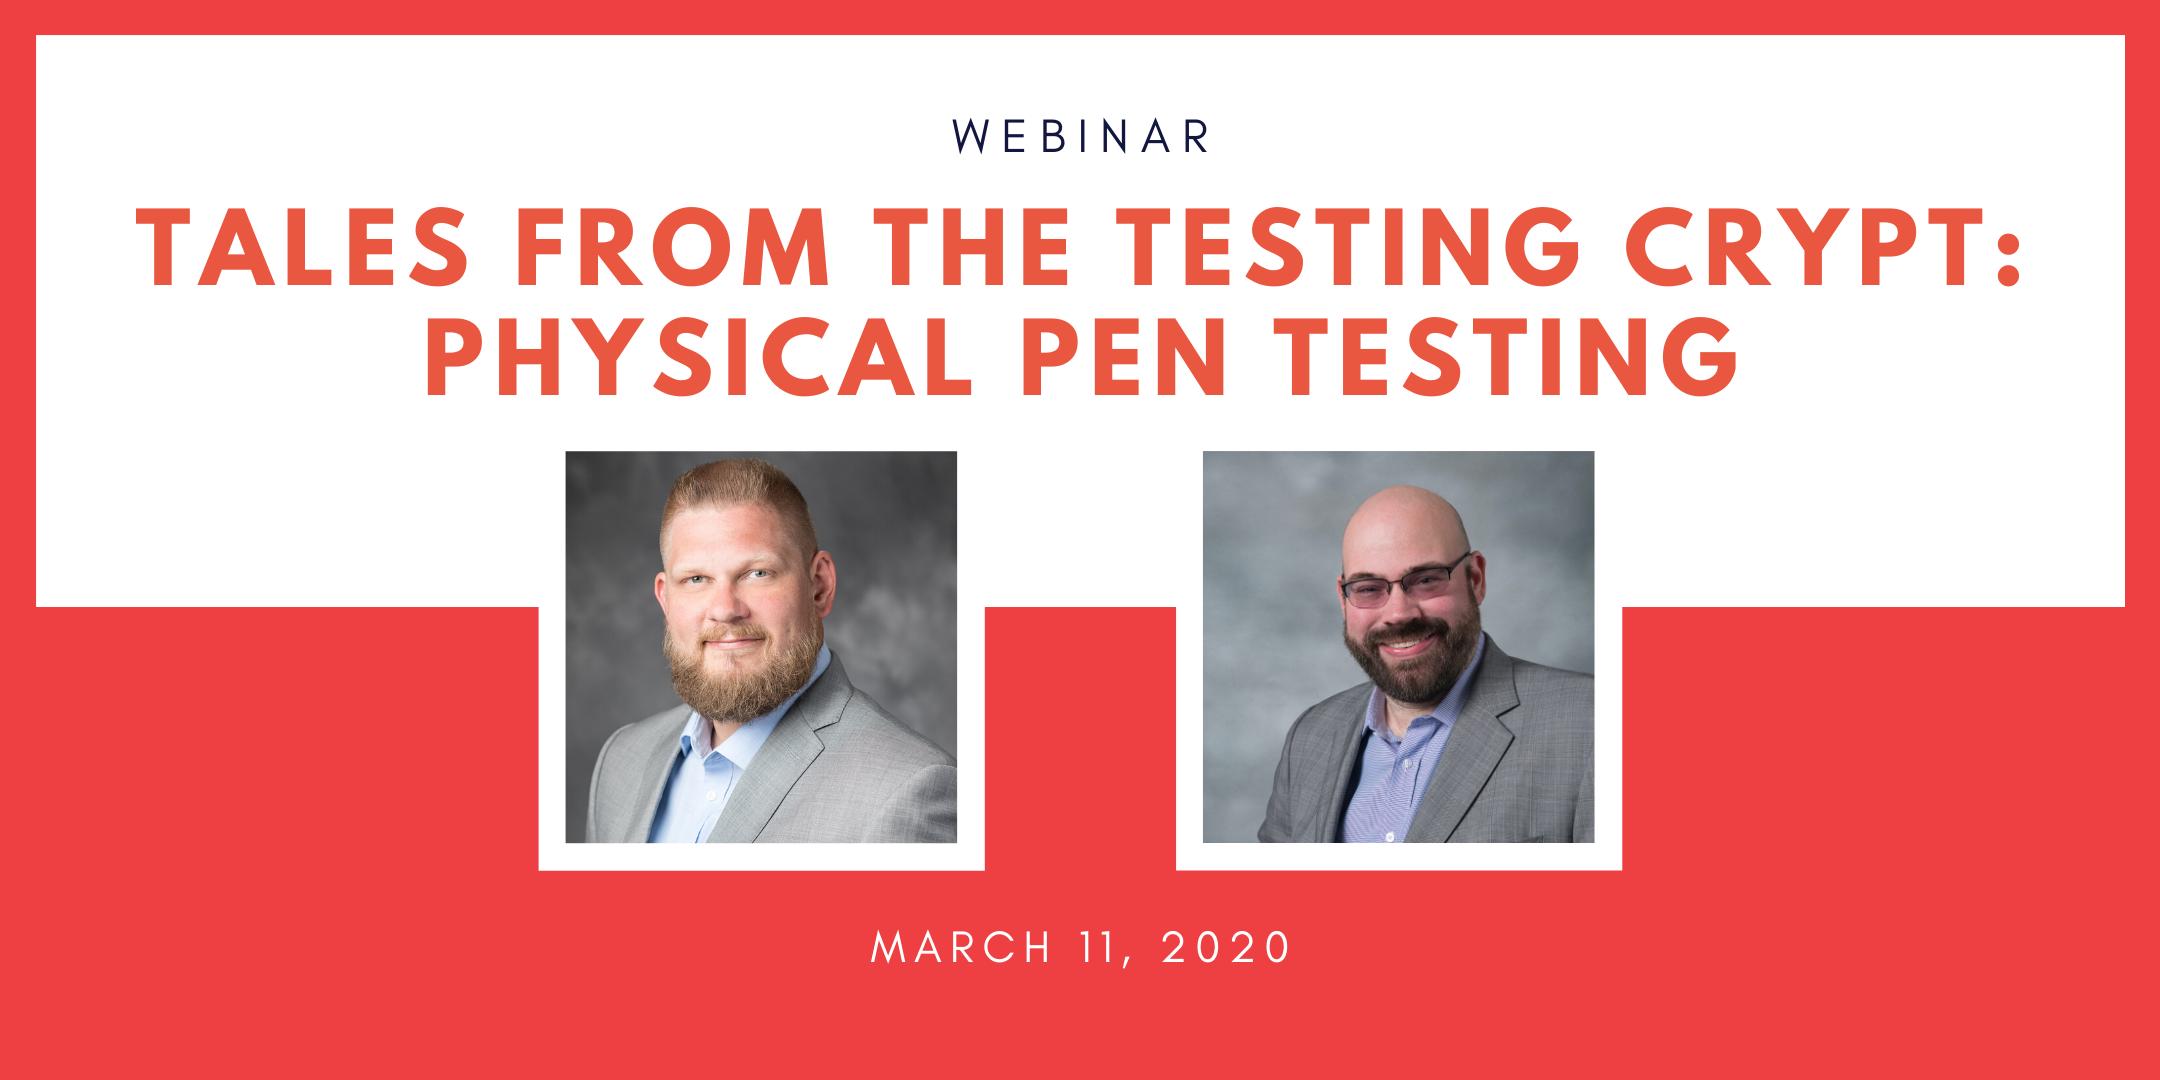 Phys-Pen-Test-Webinar-Blog